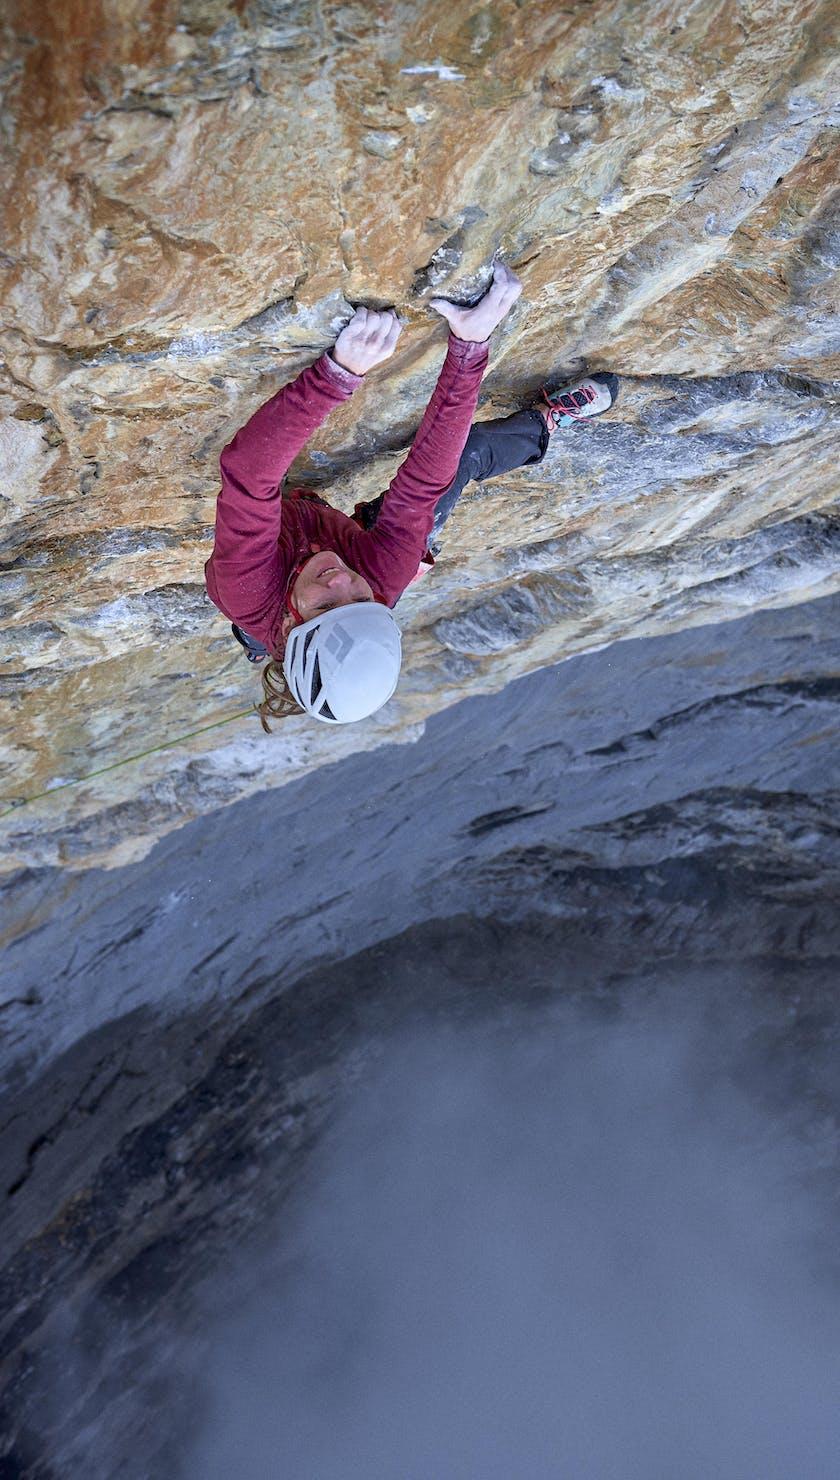 Black Diamond athlete Babsi Zangerl climbing the Eiger's North Face